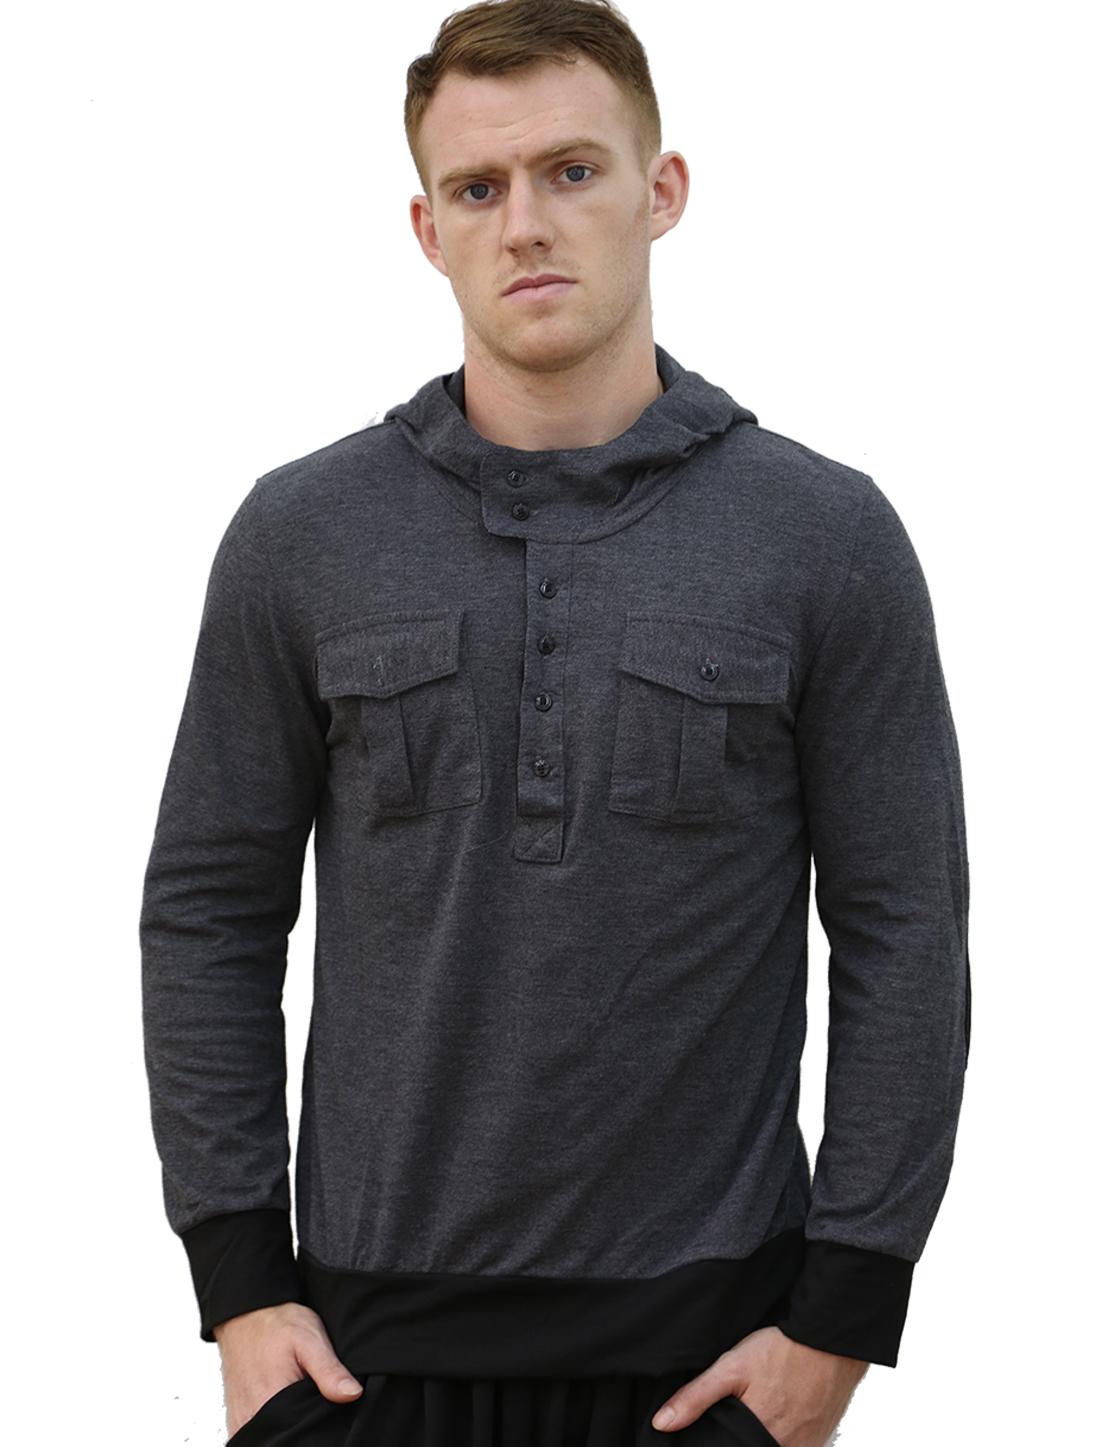 Men Long Sleeve Buttoned Pockets Slim Fit Hoodie T-Shirt Tee Dark Gray M